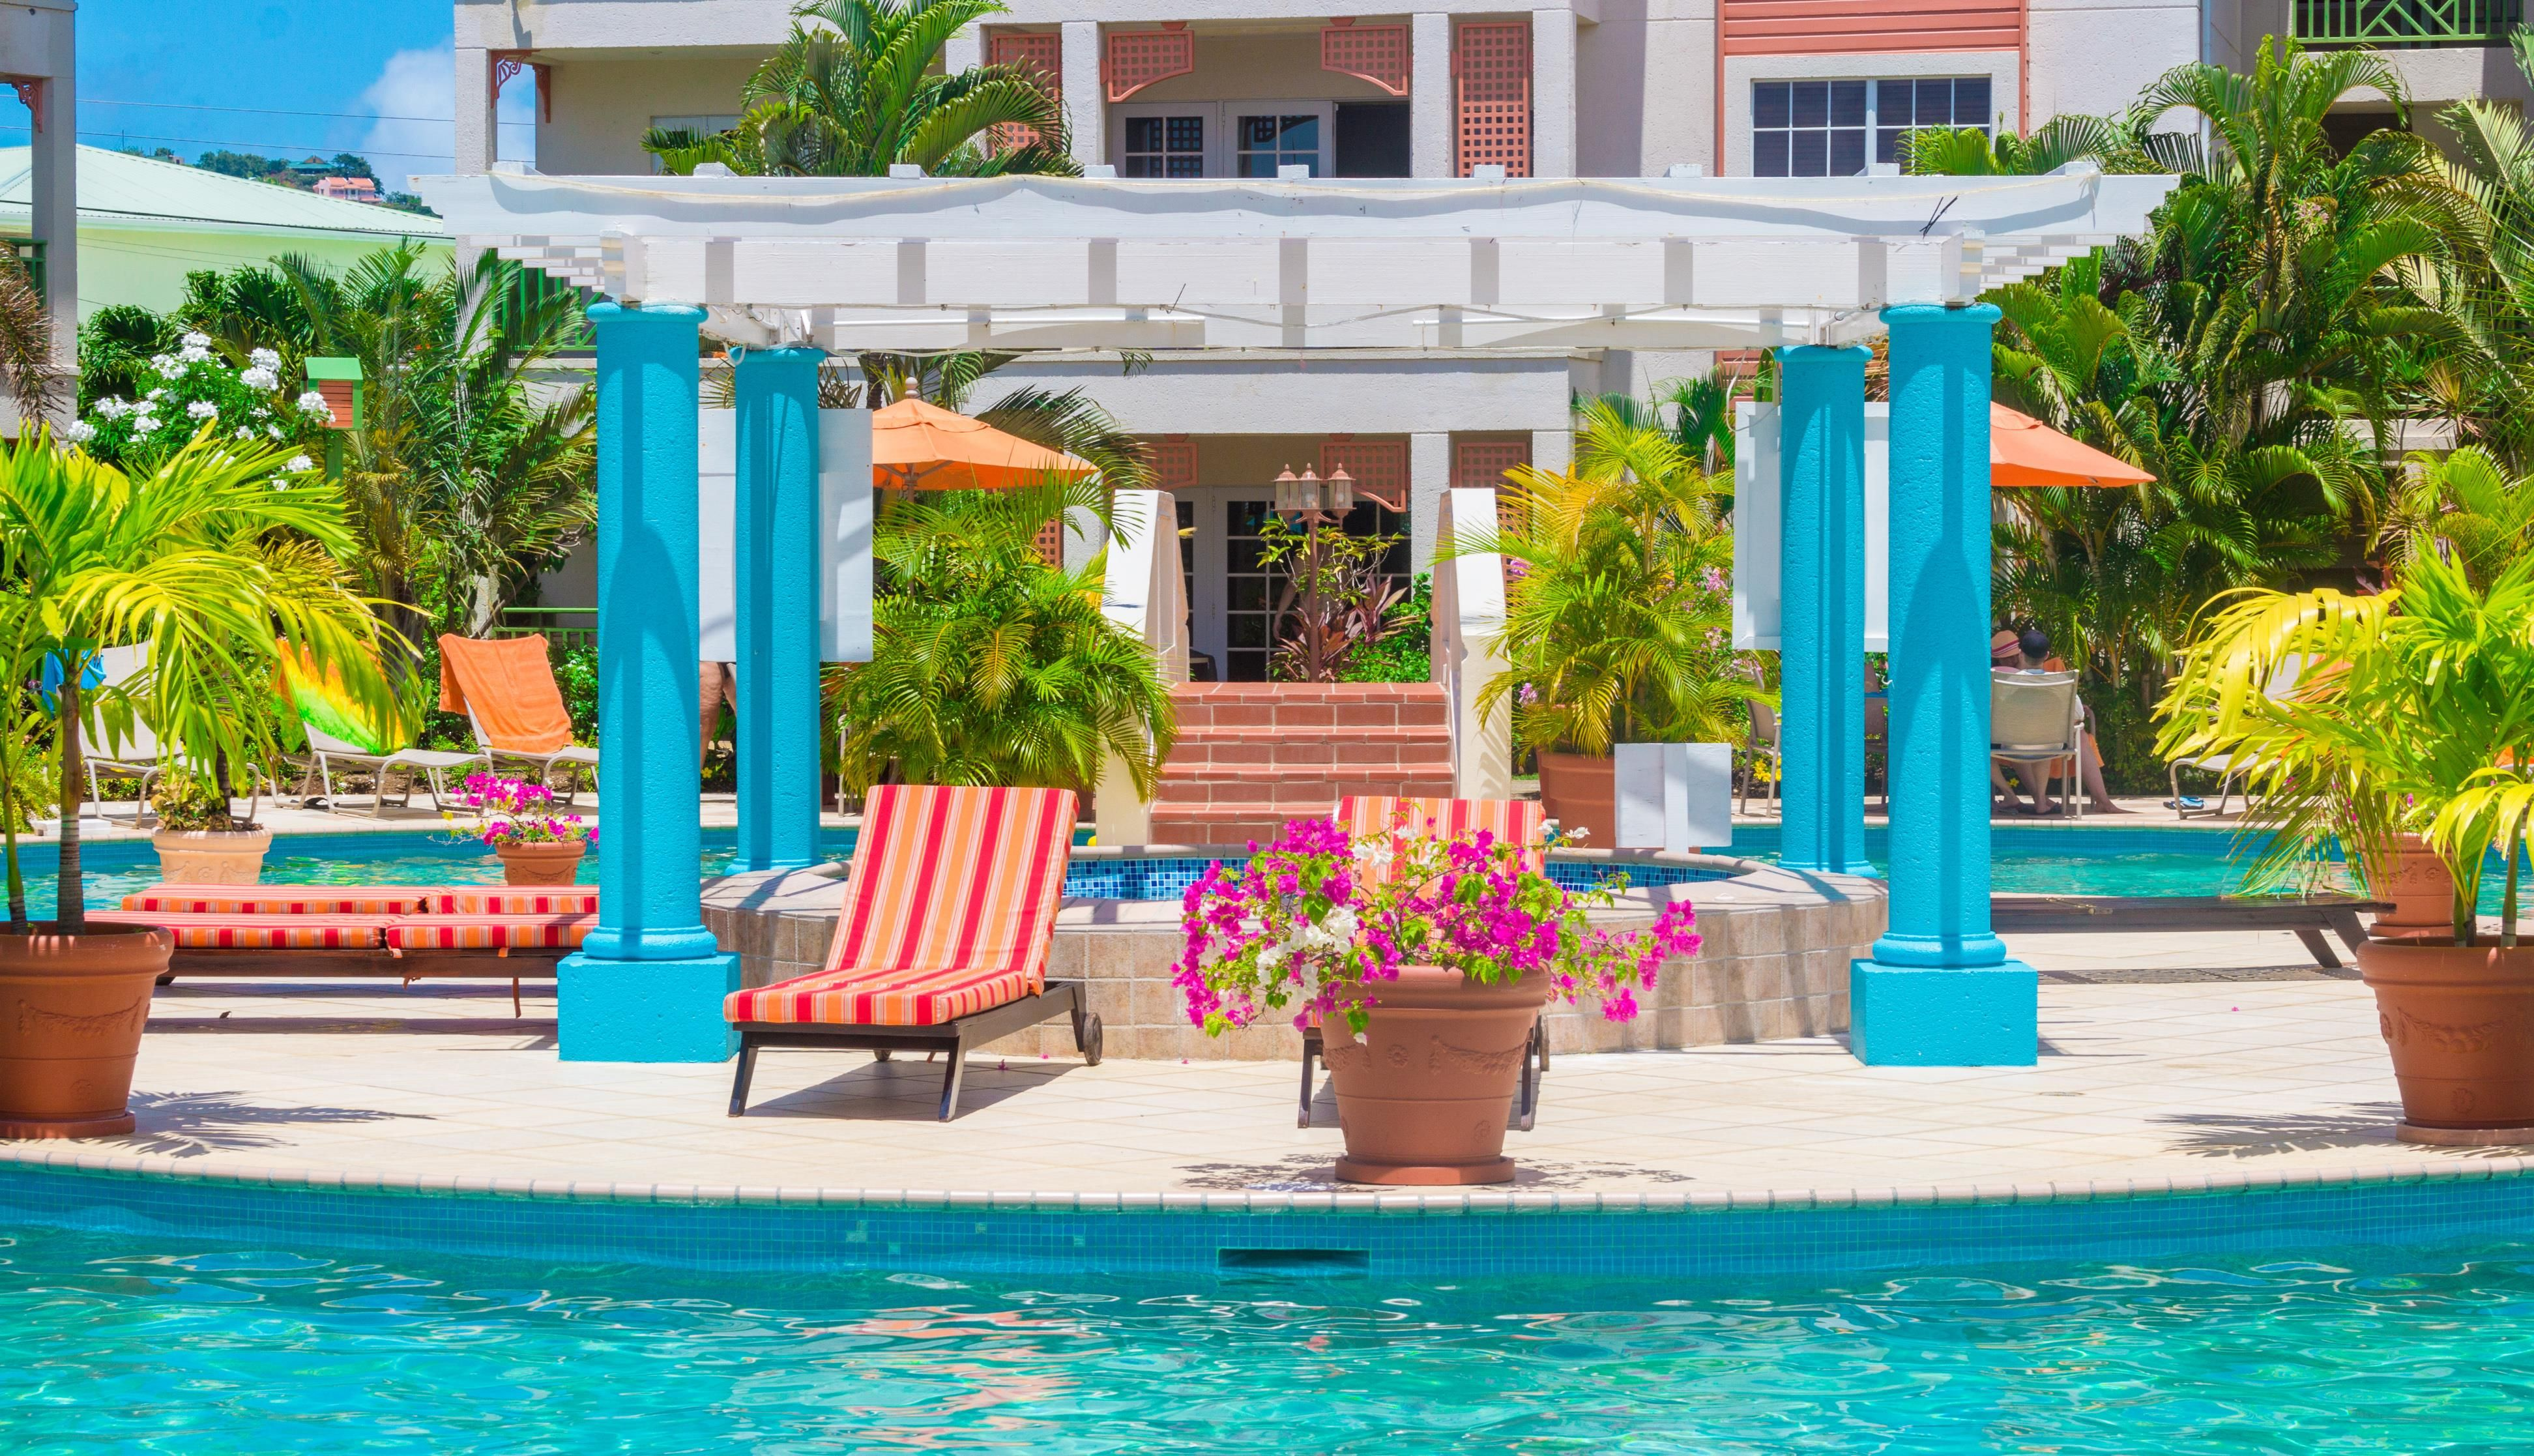 16812a4a534b40694f23e30d33c866a8 - Bay Gardens Beach Resort St Lucia Caribbean